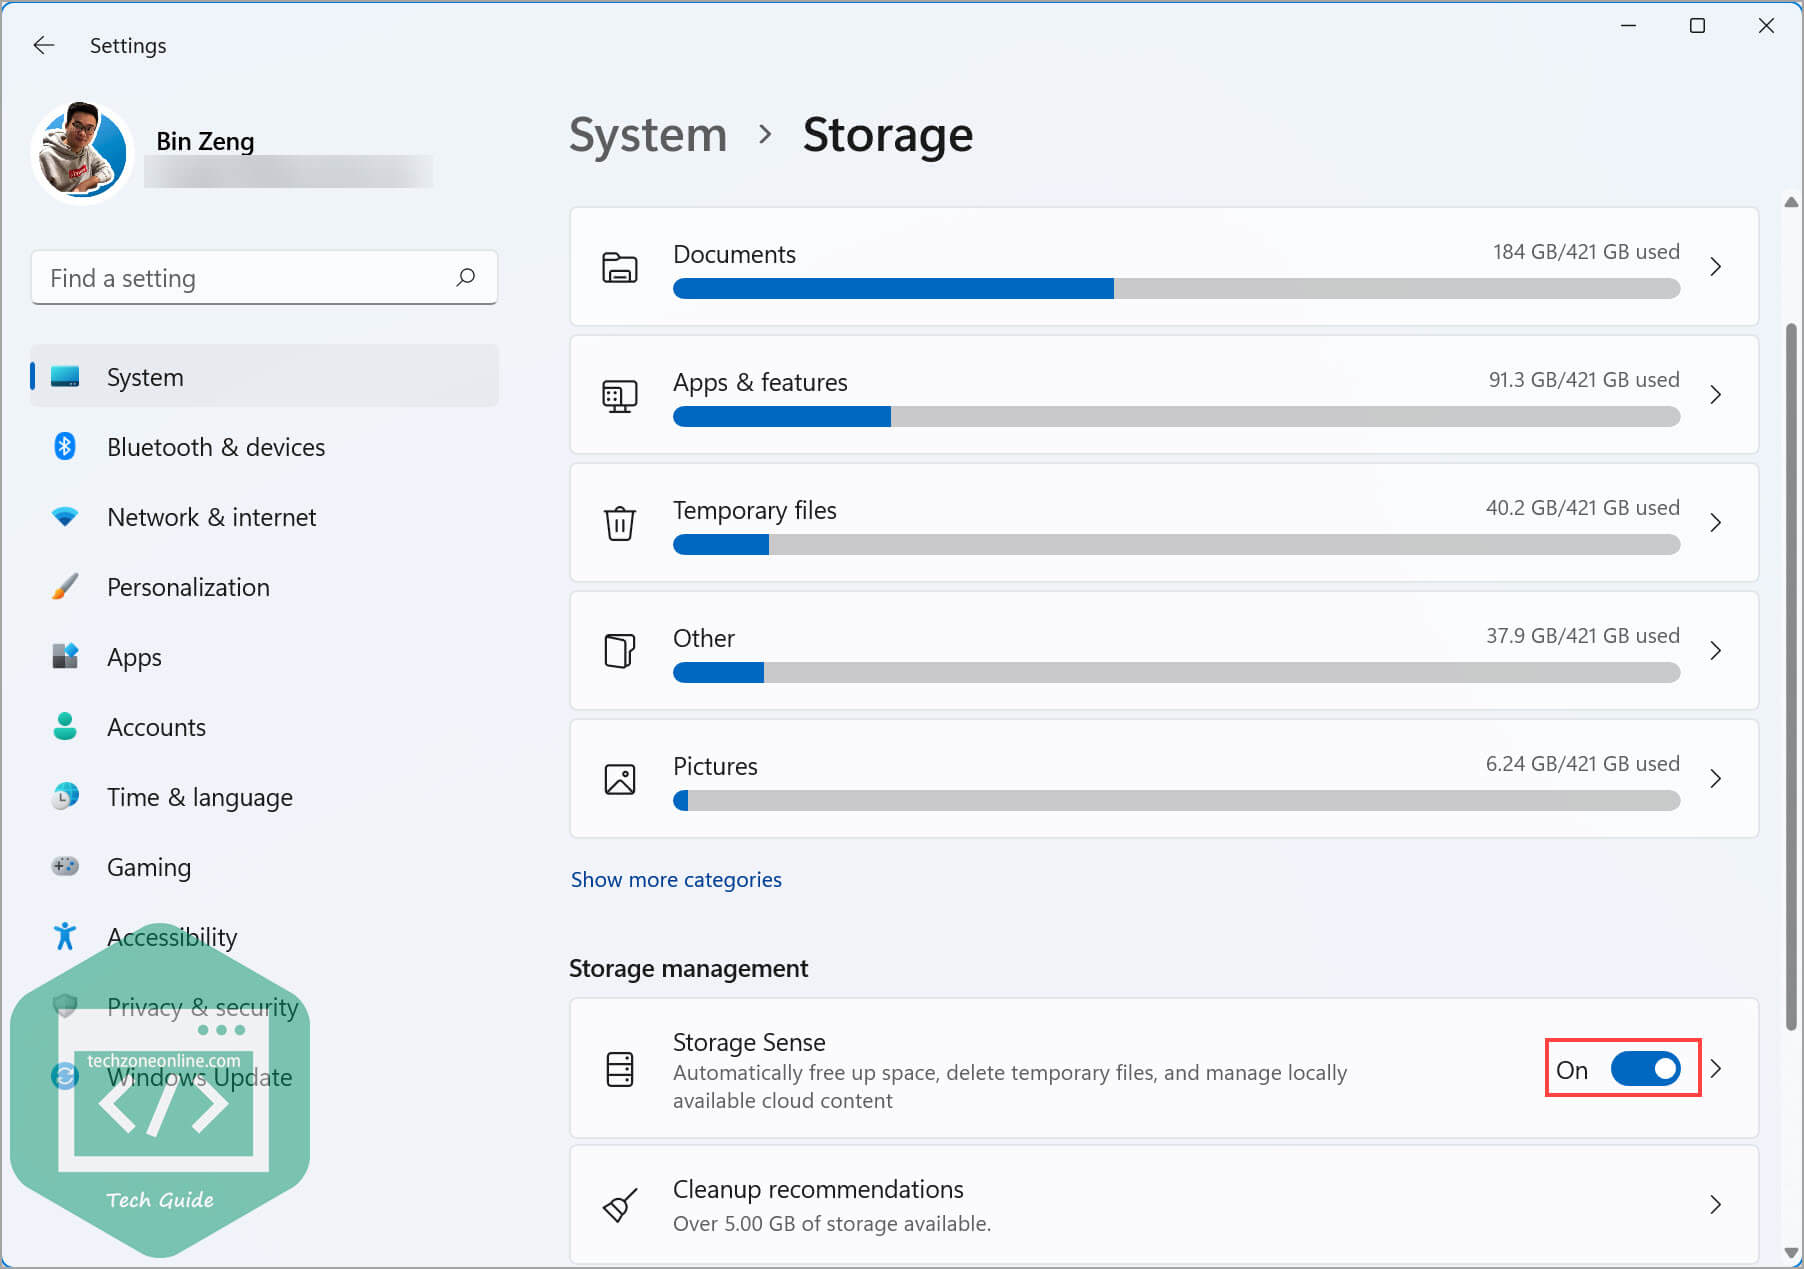 Turn on Storage Sense